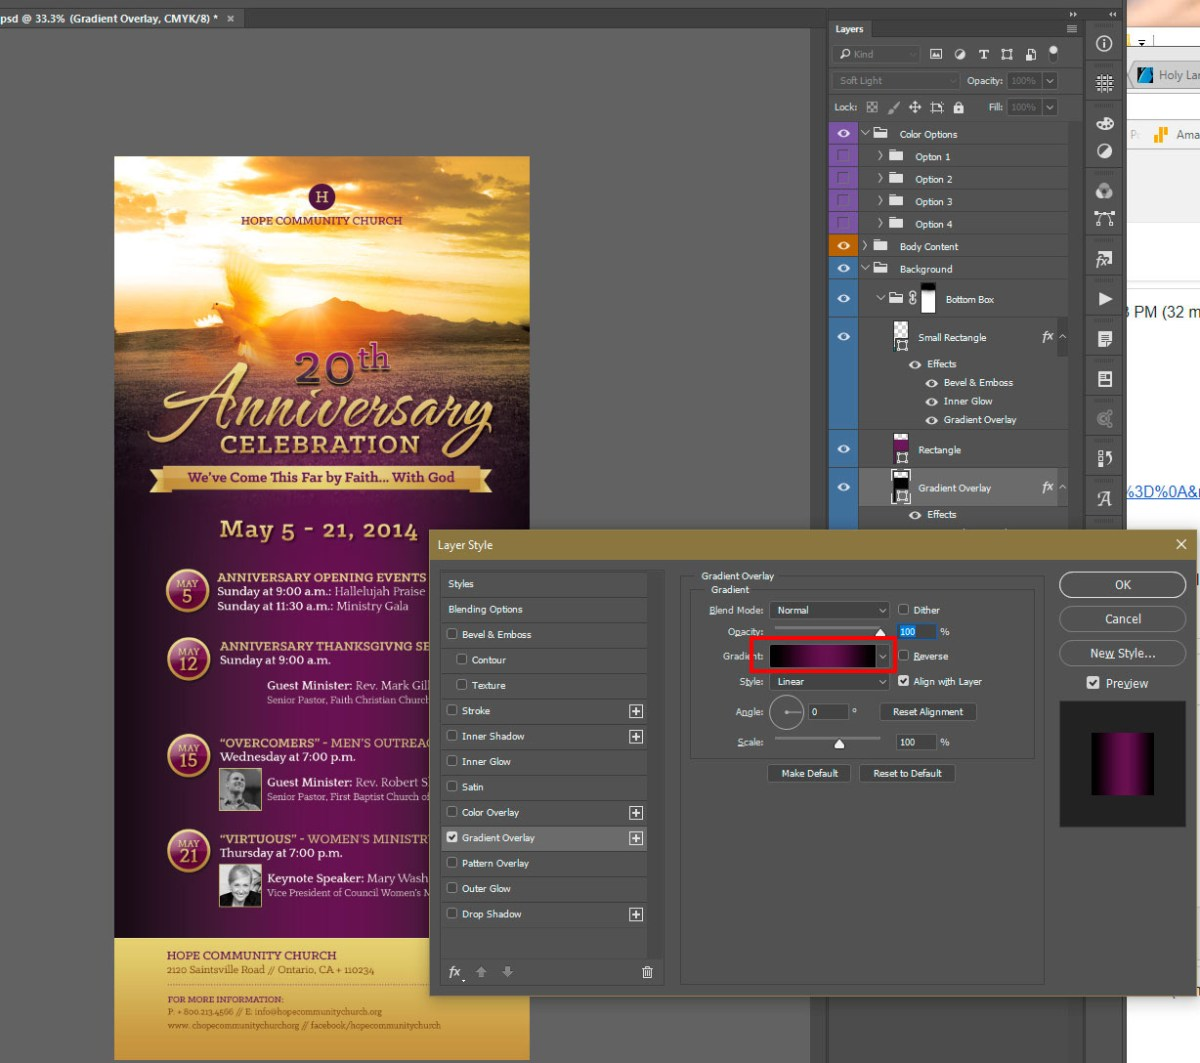 Photoshop Layer Styles panel